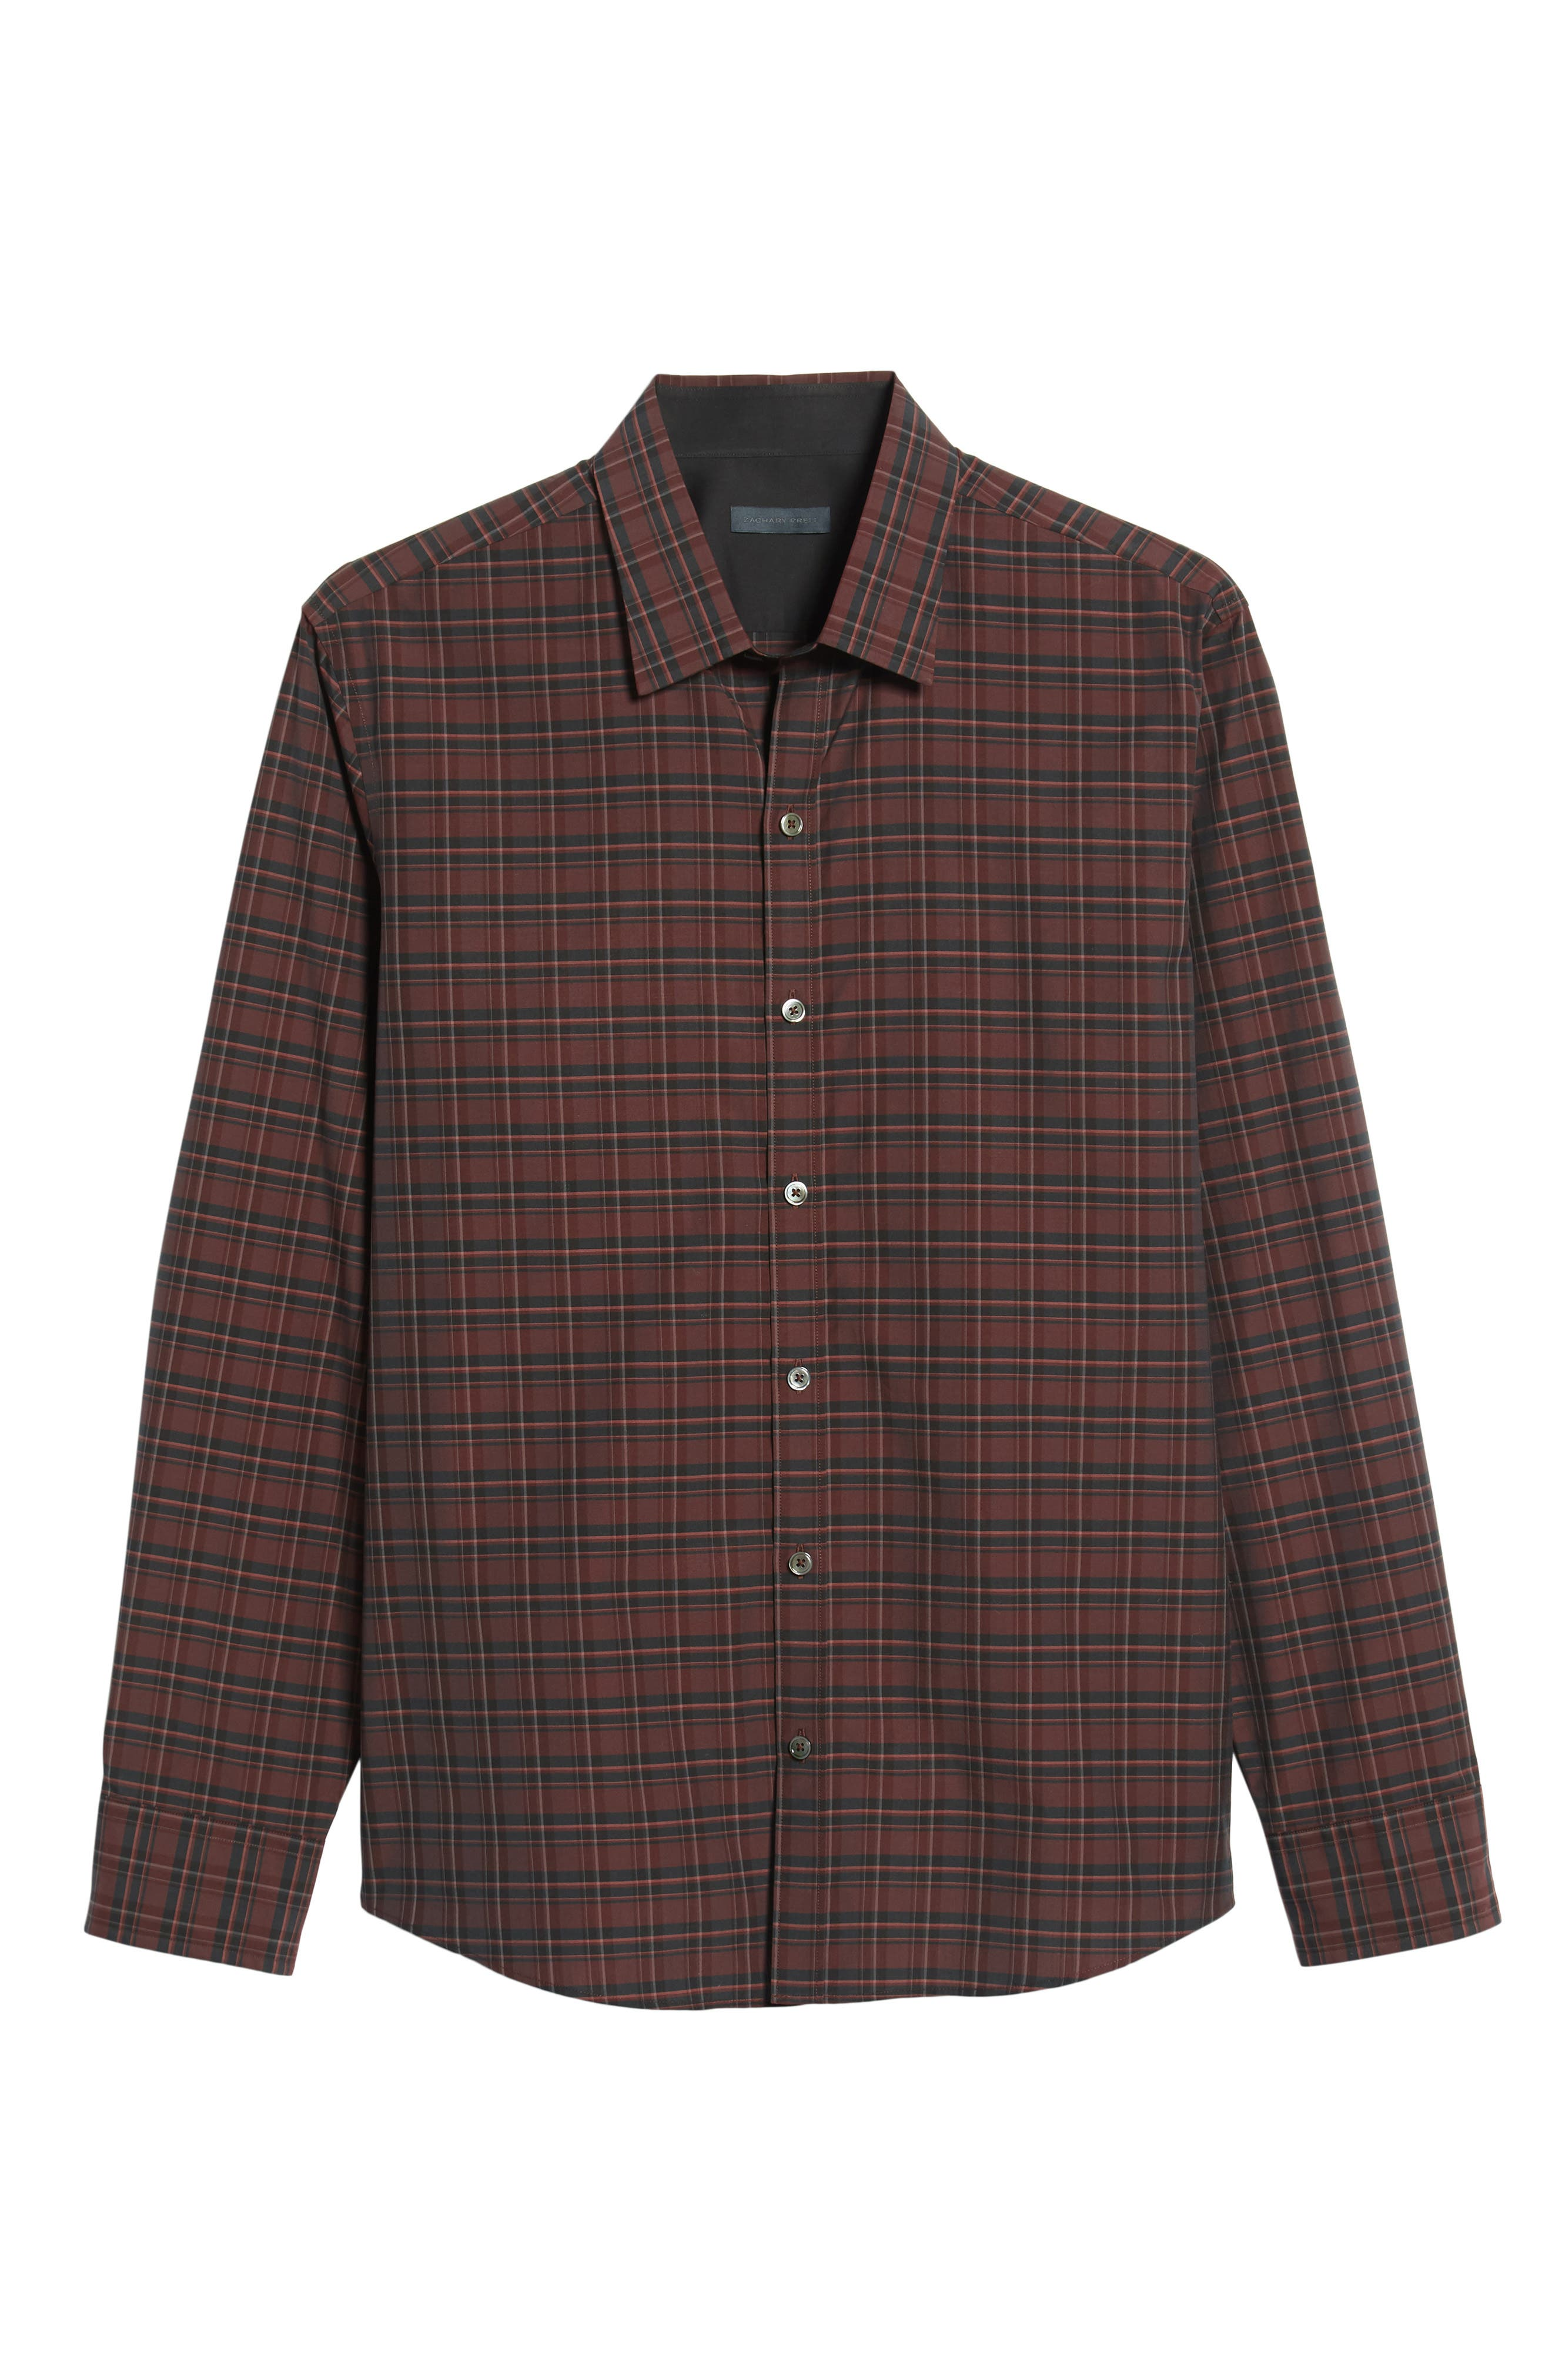 ZACHARY PRELL, Sunny Regular Fit Sport Shirt, Alternate thumbnail 5, color, RUBY